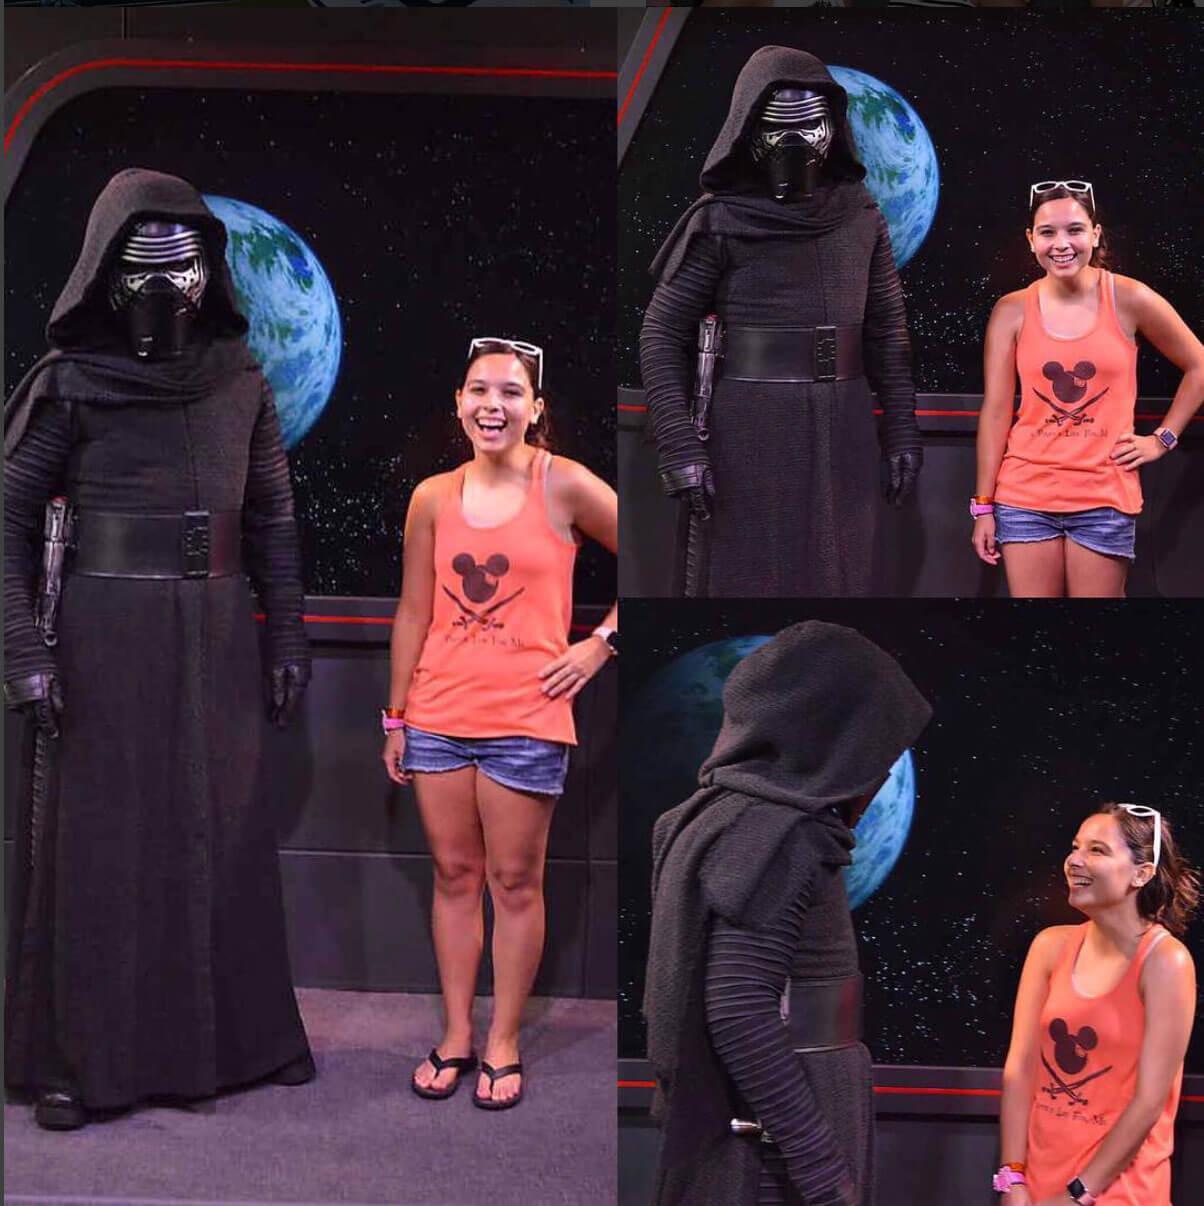 Experience Star Wars at Hollywood Studios - Meeting Kylo Ren